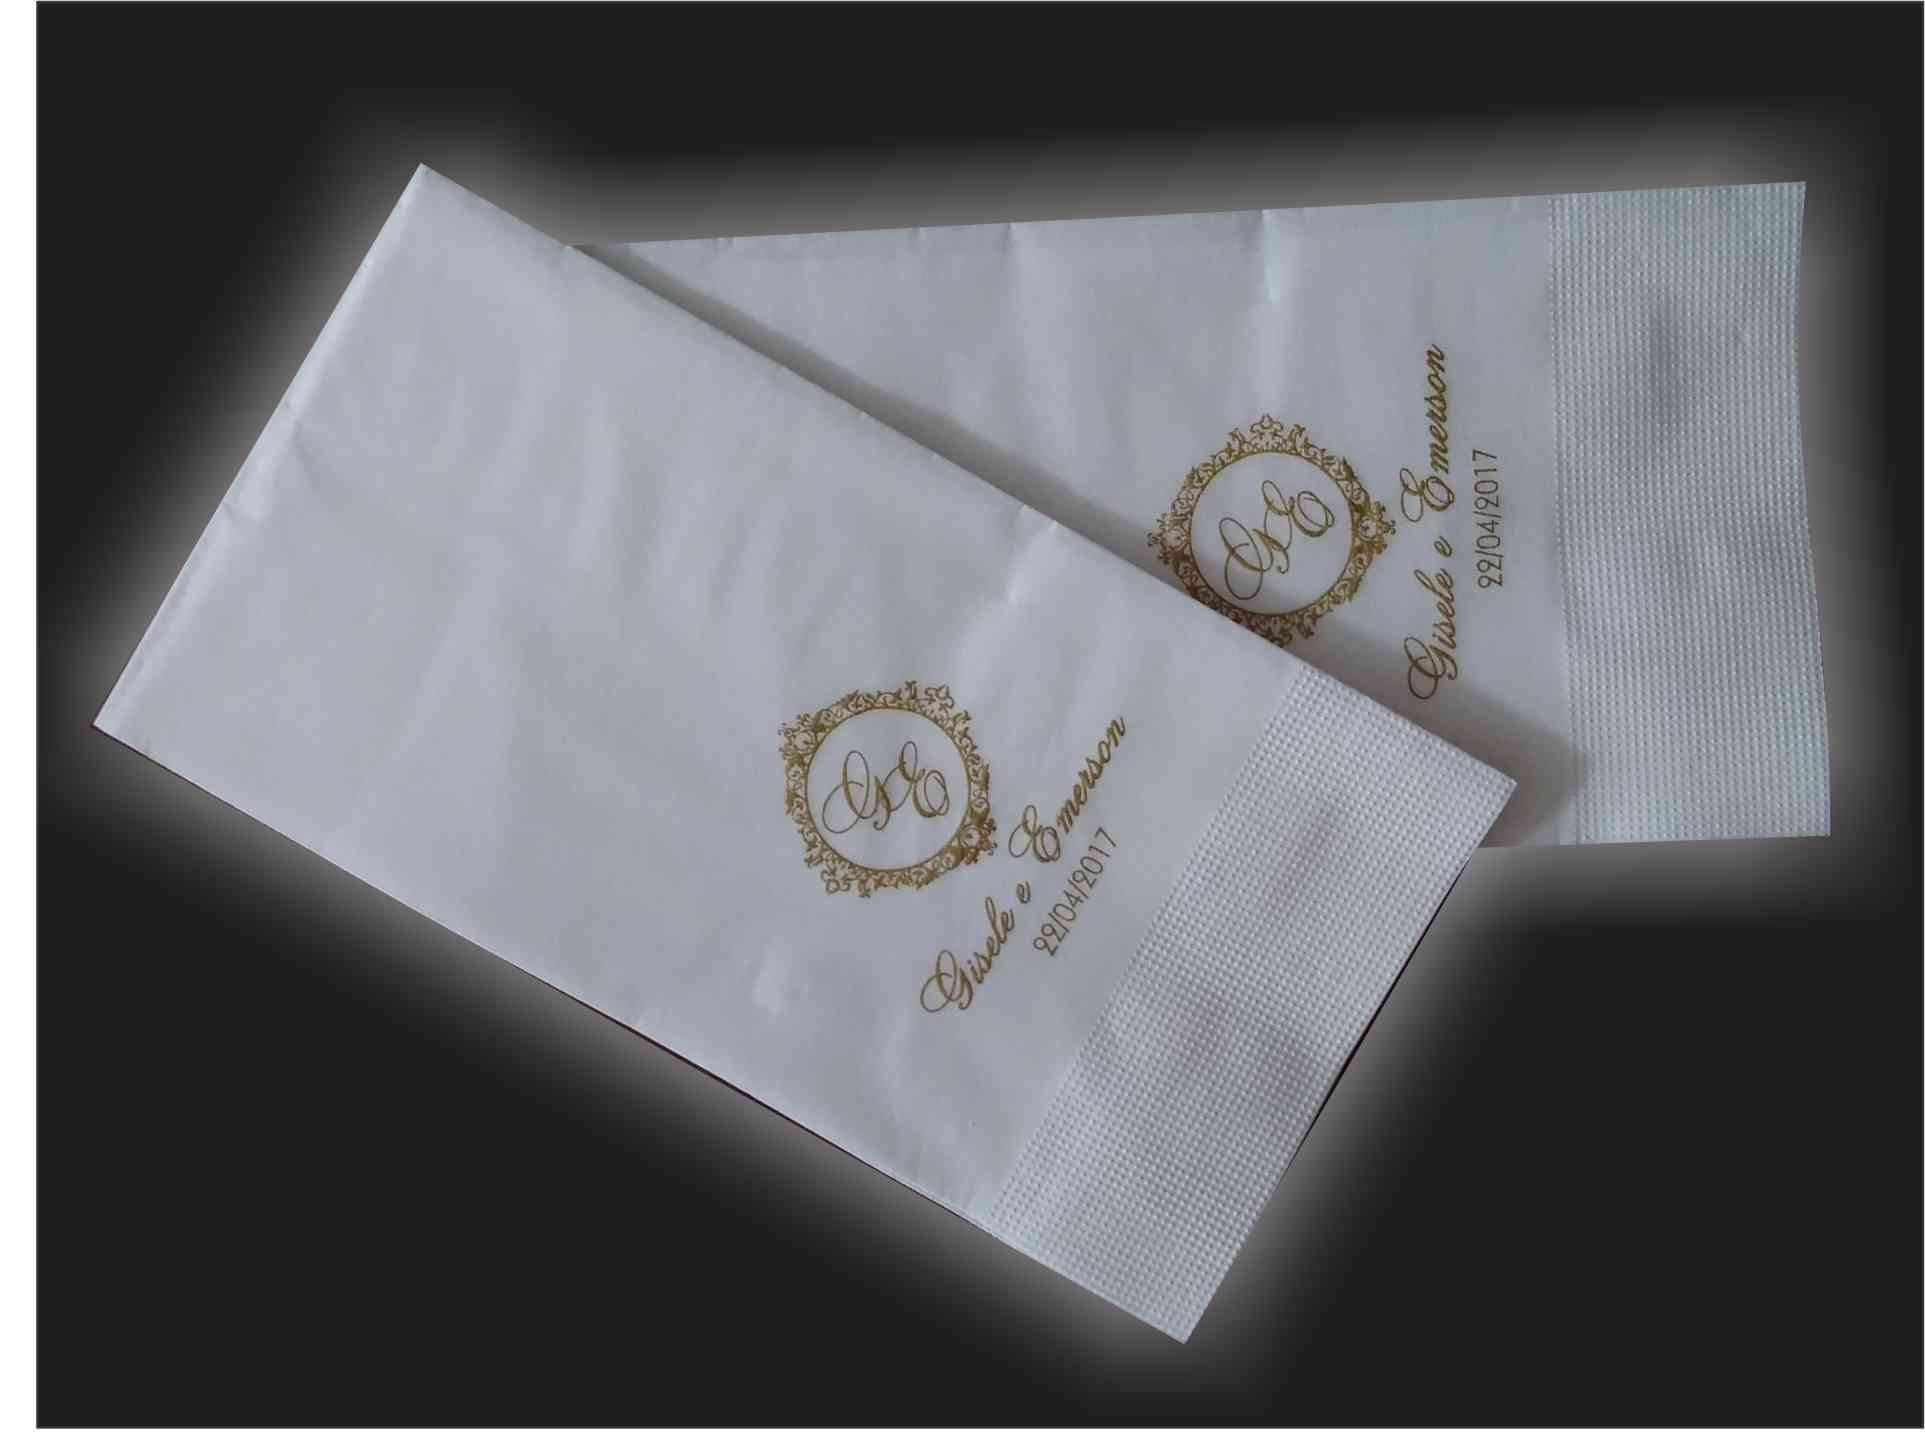 Guardanapo de papel mod. tradicional 40x40 cm Personalizado - 100 unidades  - Persona Guardanapos & Cia